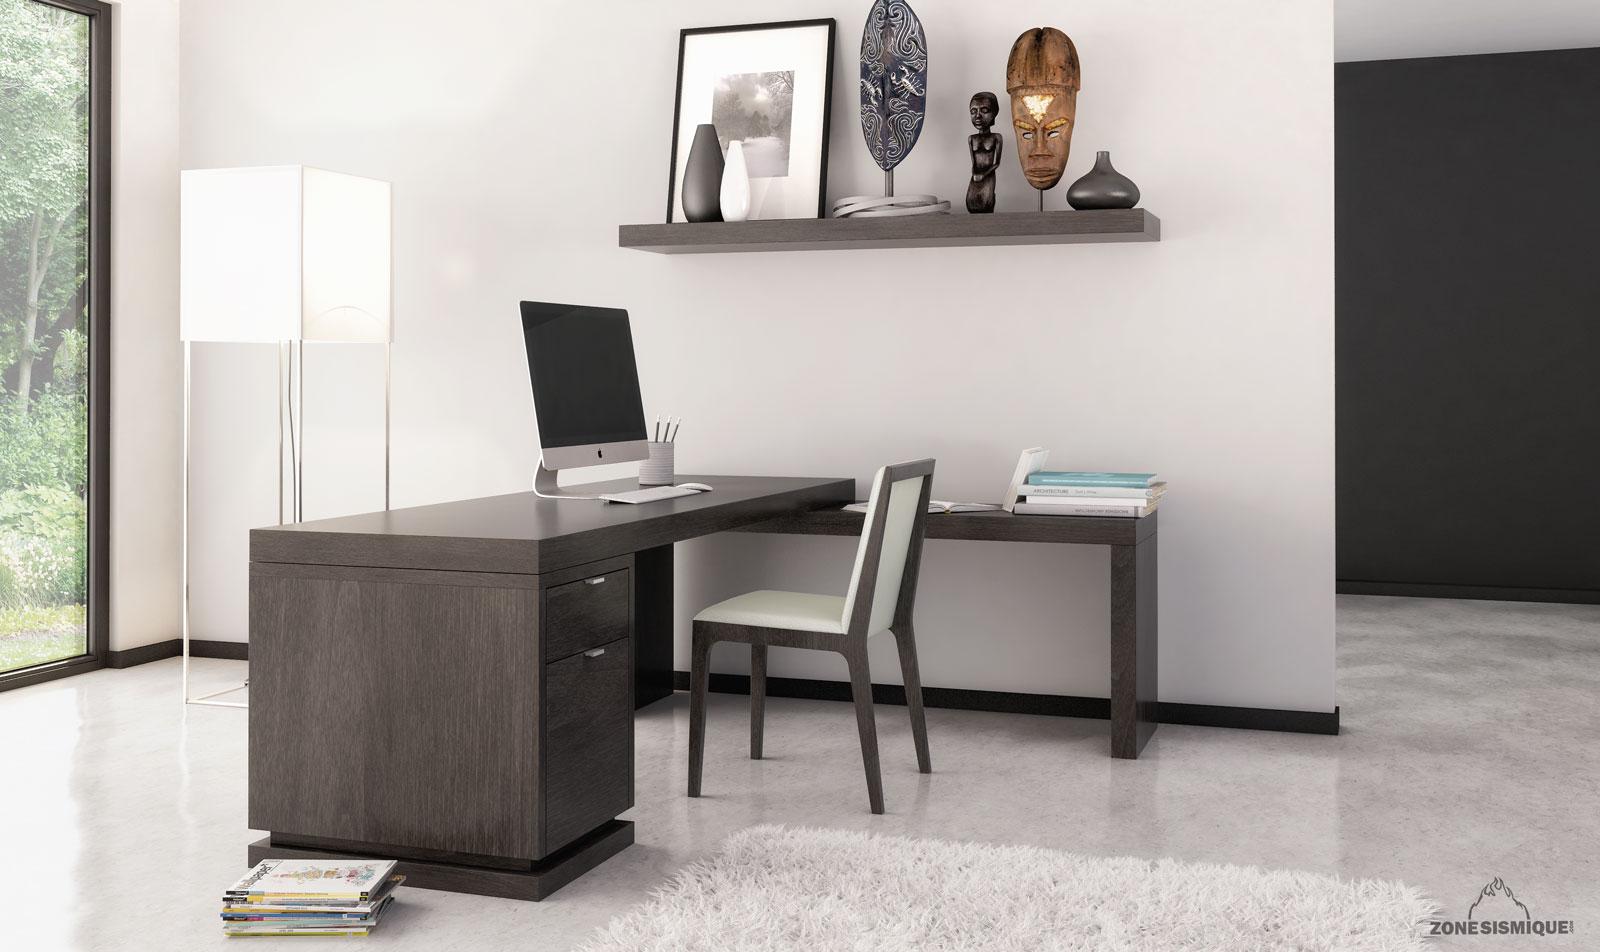 zone sismique huppe otello bureau 3d v1 zone sismique design industriel 3d graphique. Black Bedroom Furniture Sets. Home Design Ideas